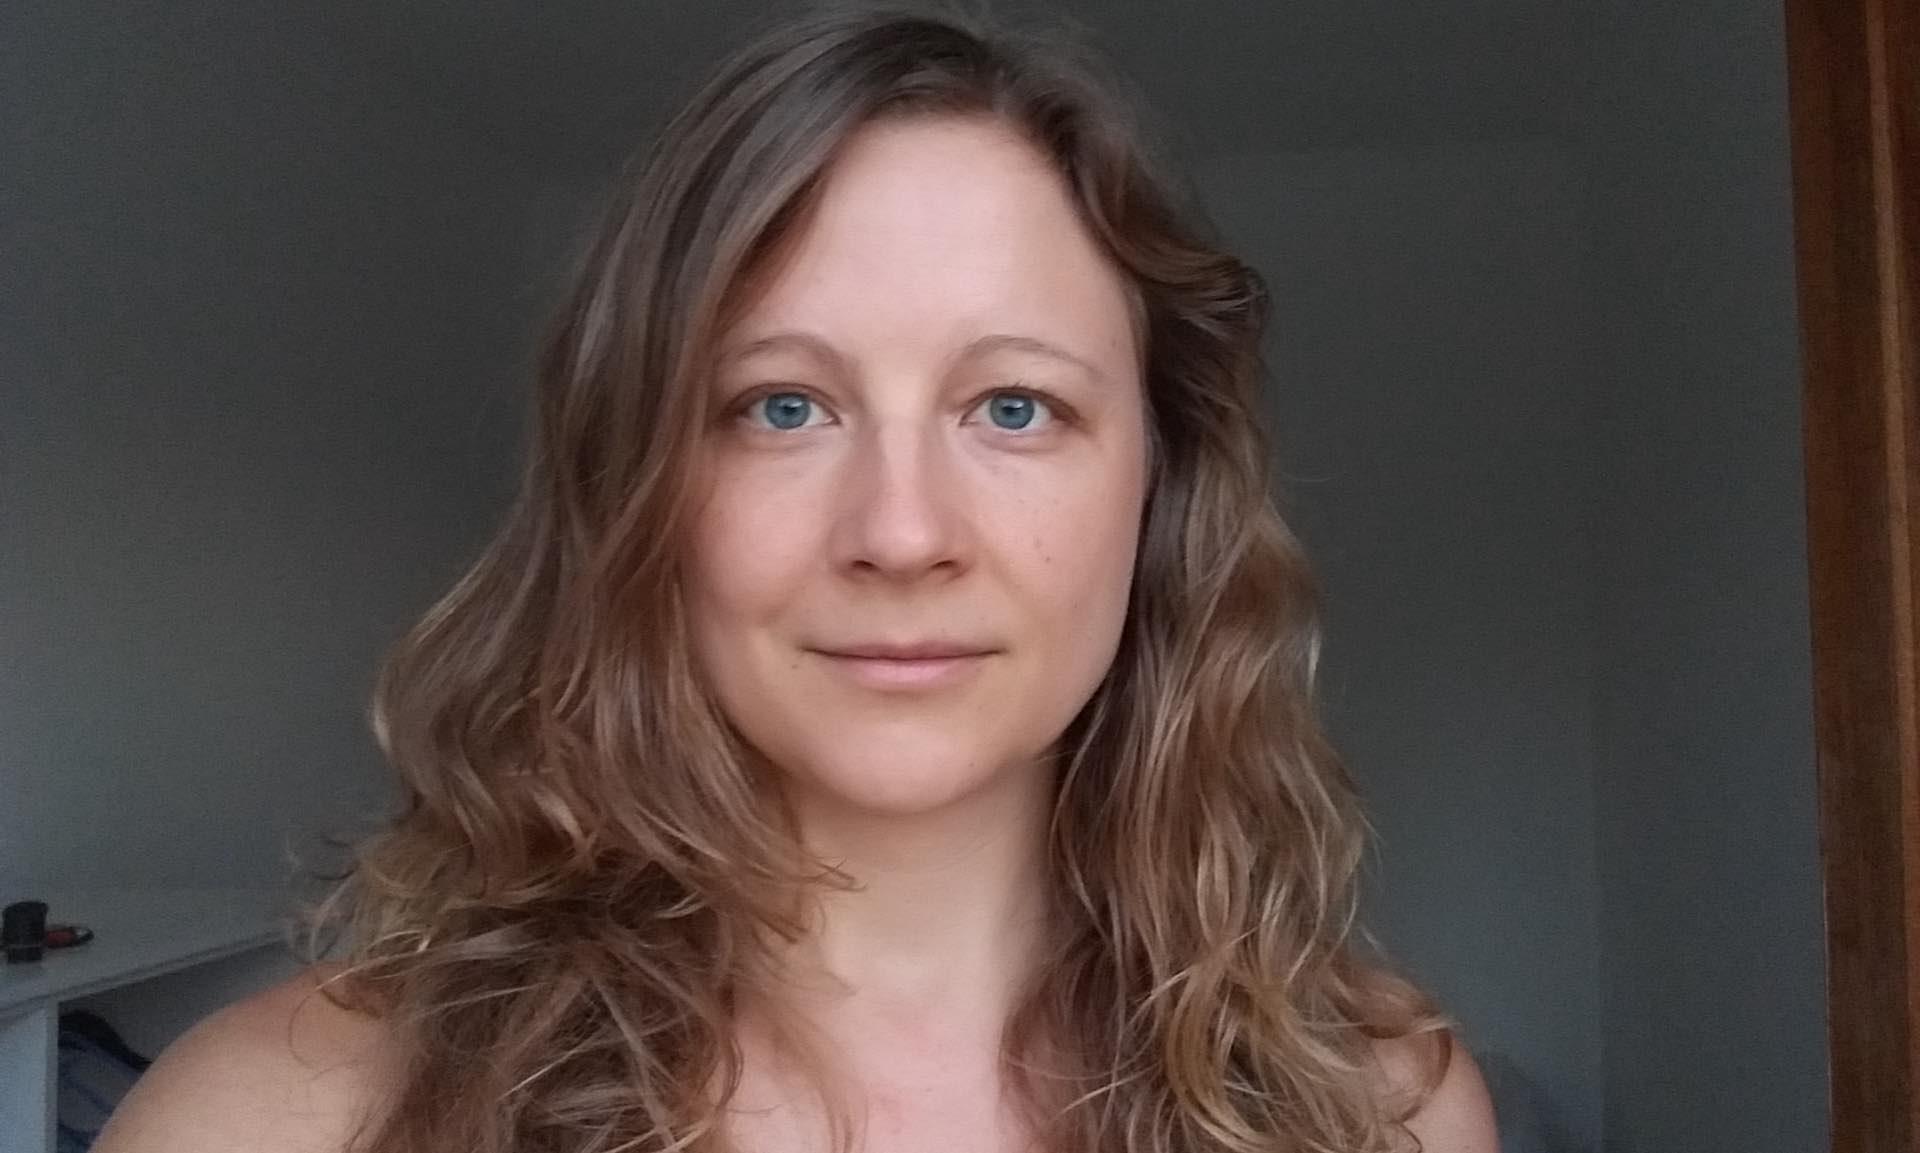 Josephine Worsek